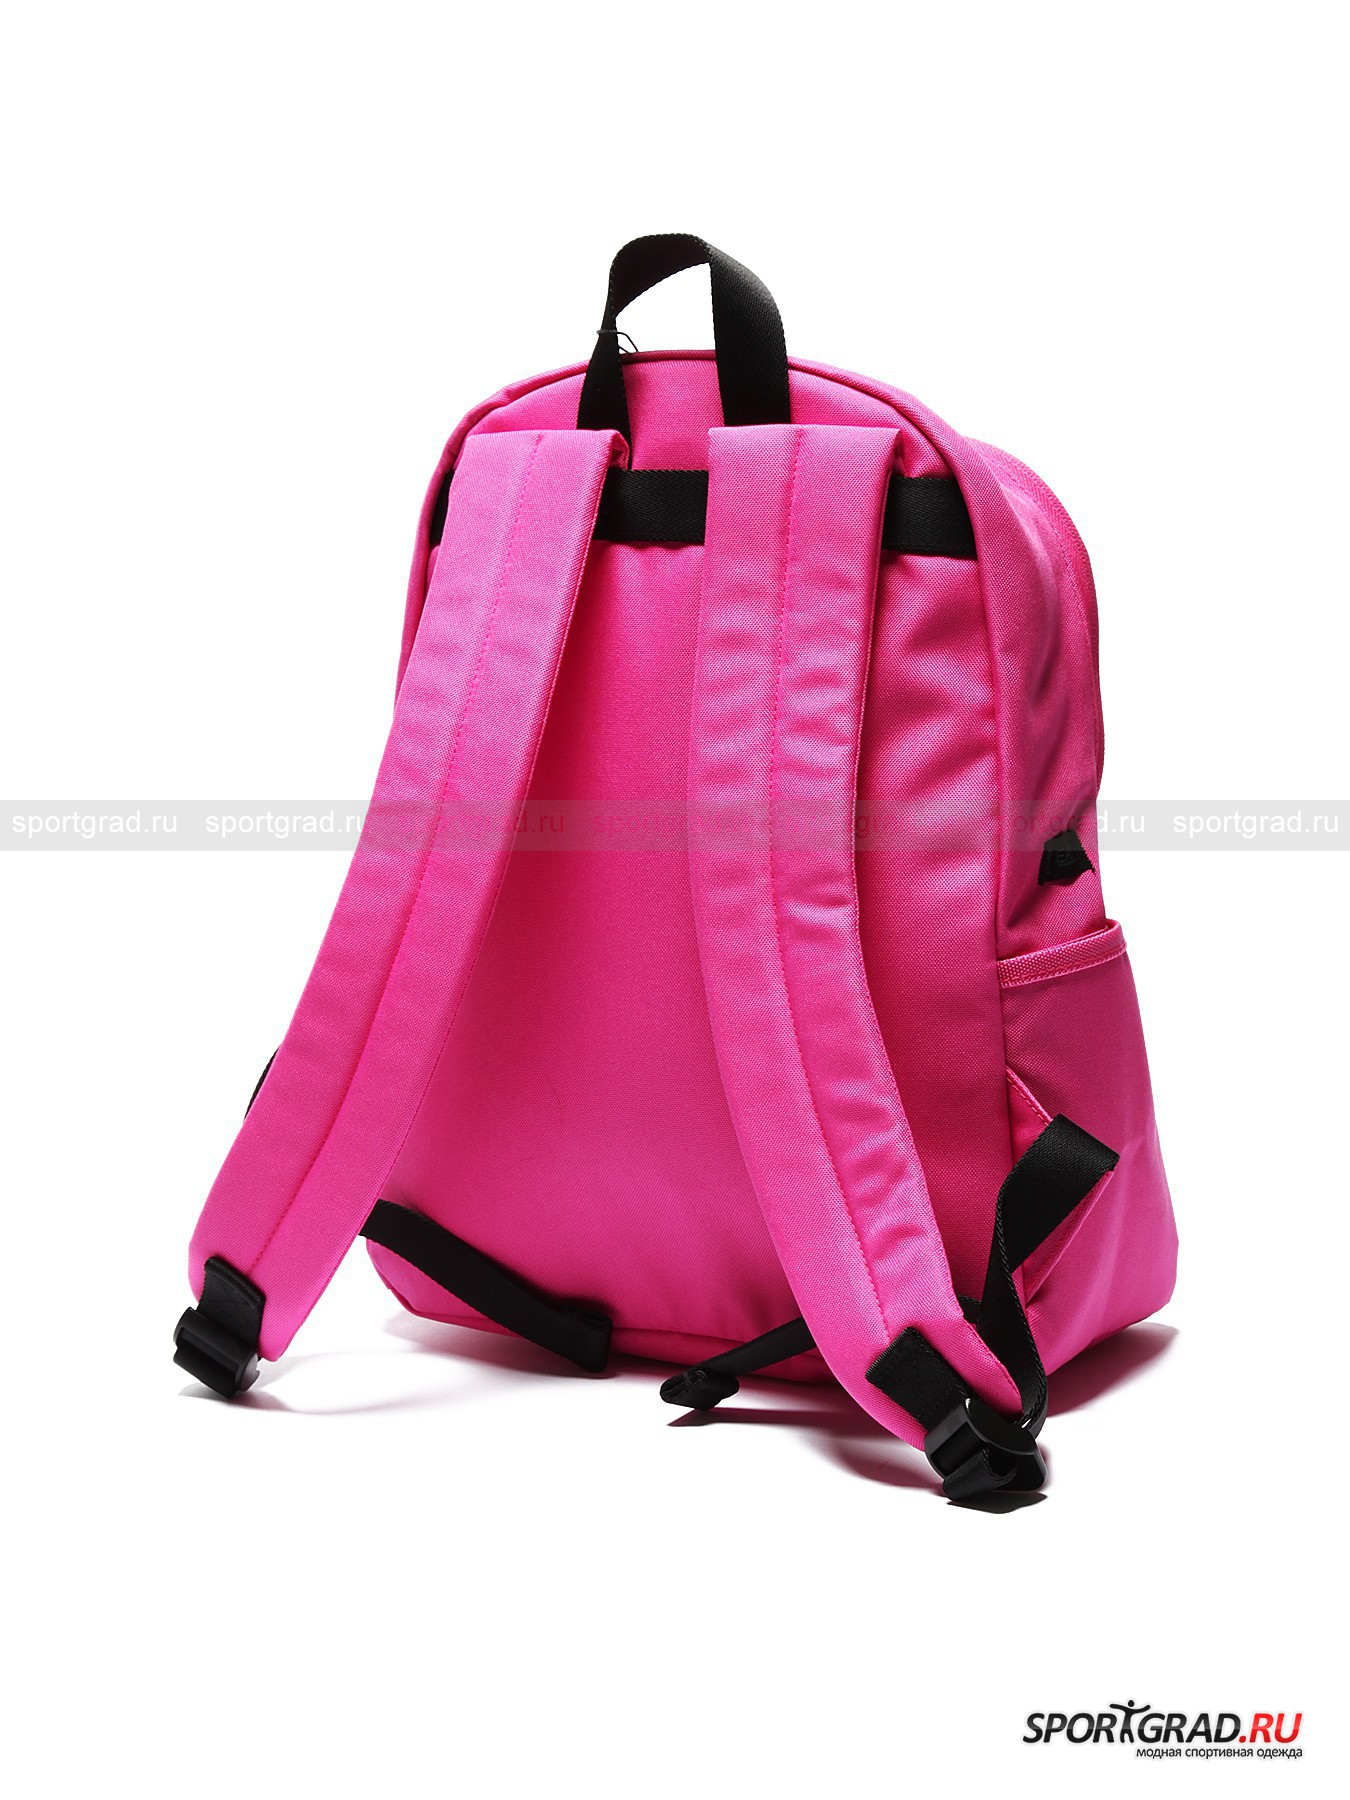 Рюкзак Core ID Lady Backpack EA7 Emporio Armani от Спортград